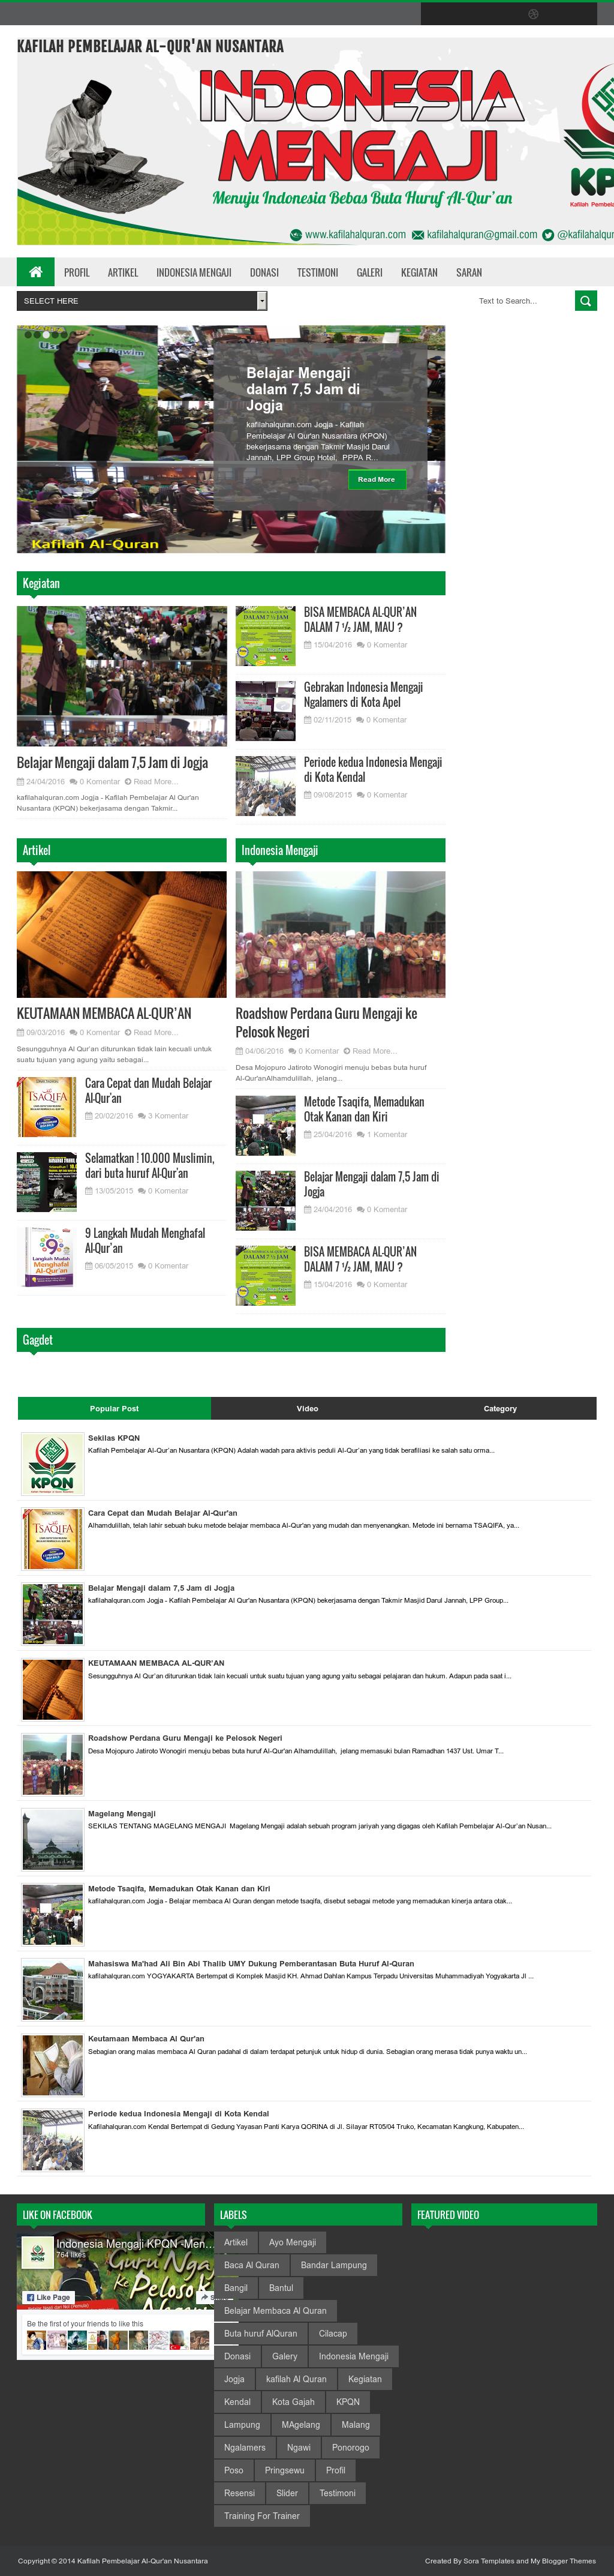 Kafilah Pembelajar Al Quran Nusantara Kpqn Competitors Revenue And 9 Langkah Mudah Menghafal Employees Owler Company Profile